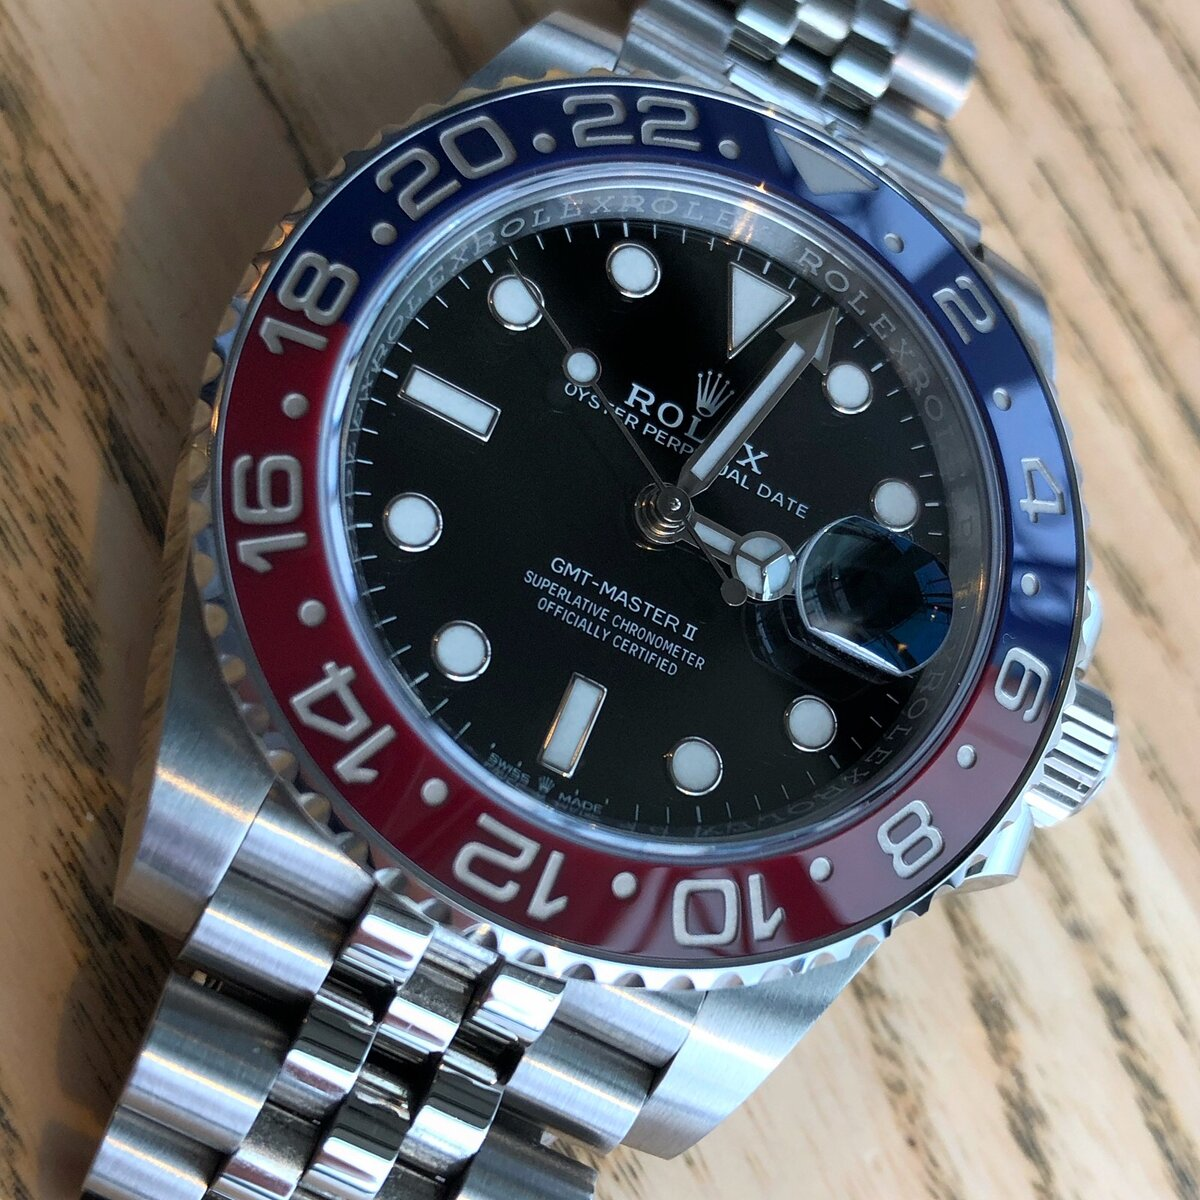 53CBFA99-E1C1-48EF-9CD3-AB2ABB2B7829.